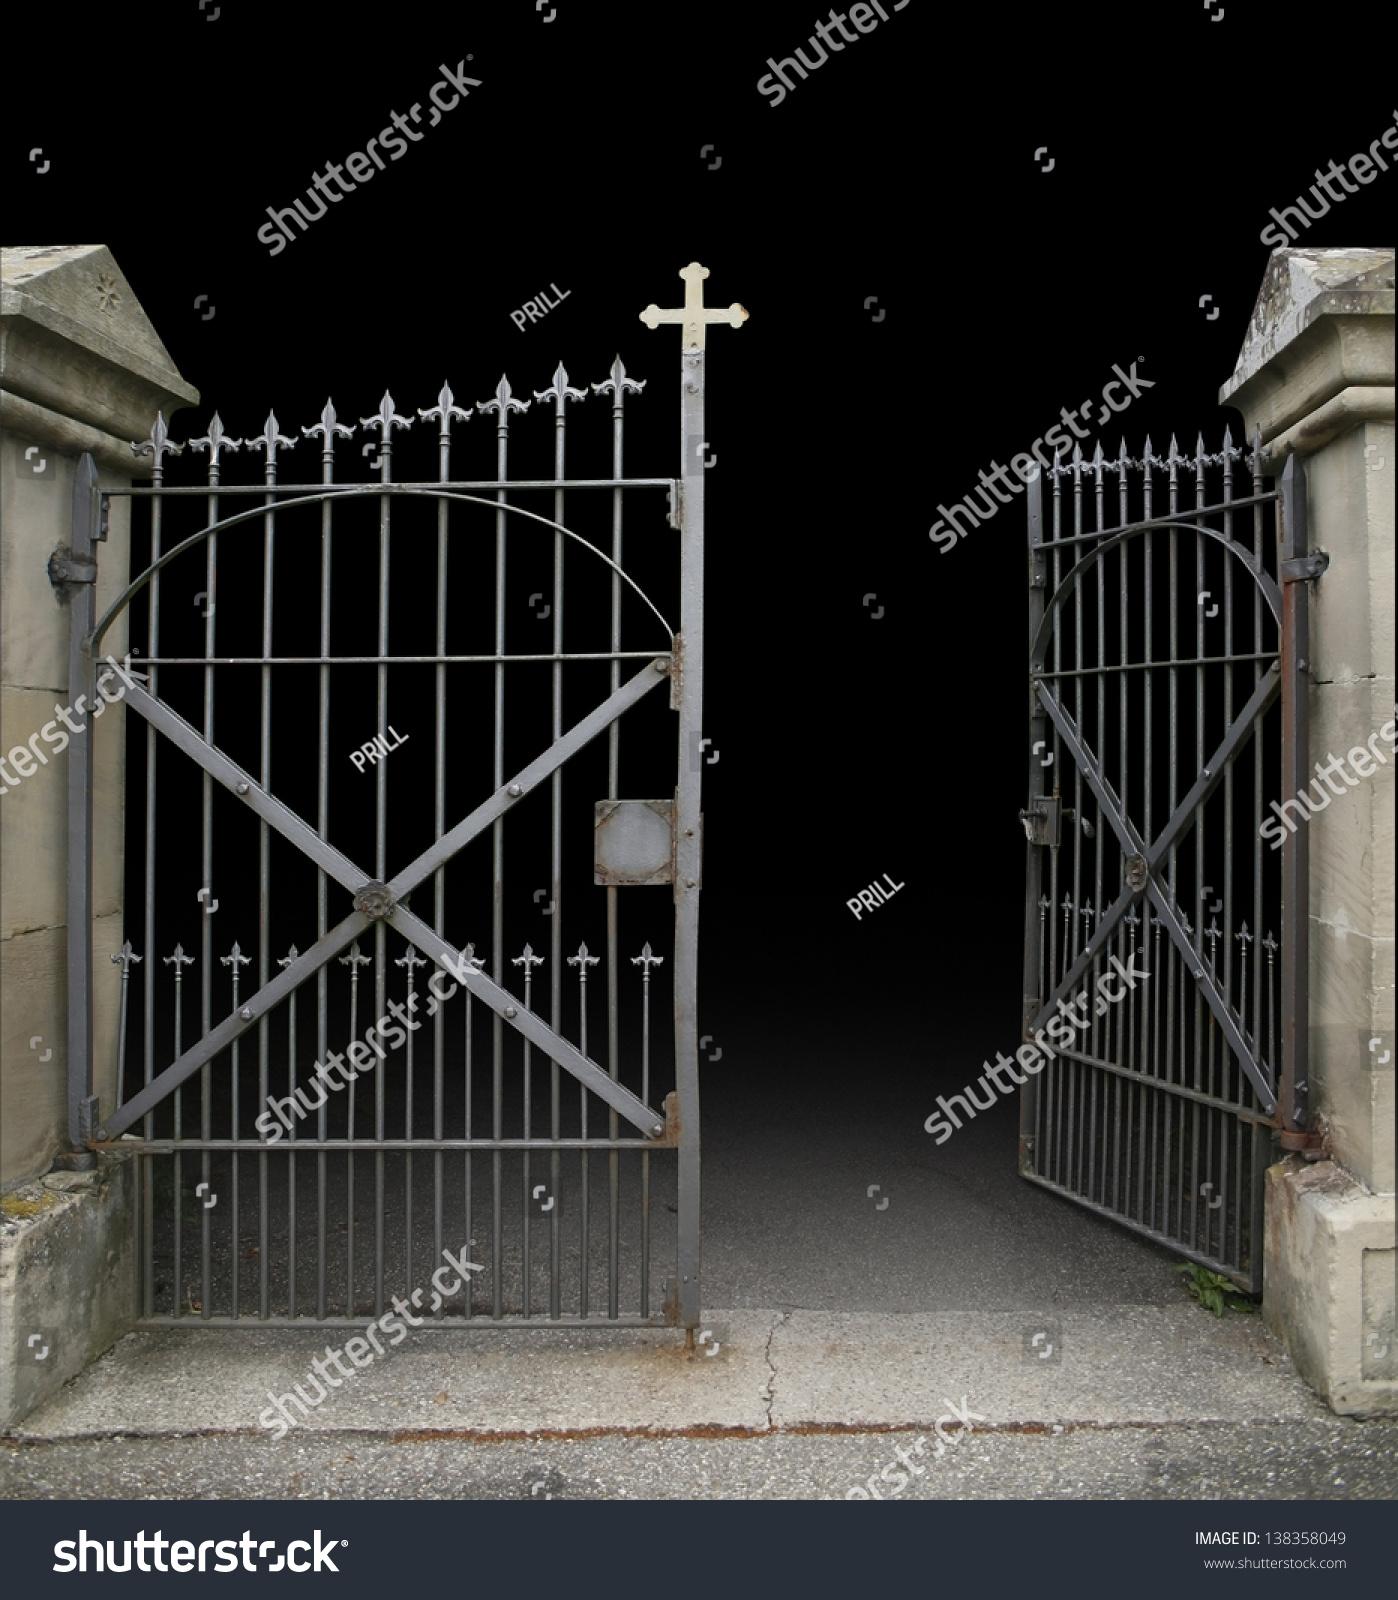 Entrance Graveyard Open Wroughtiron Gate Dark Stock Photo